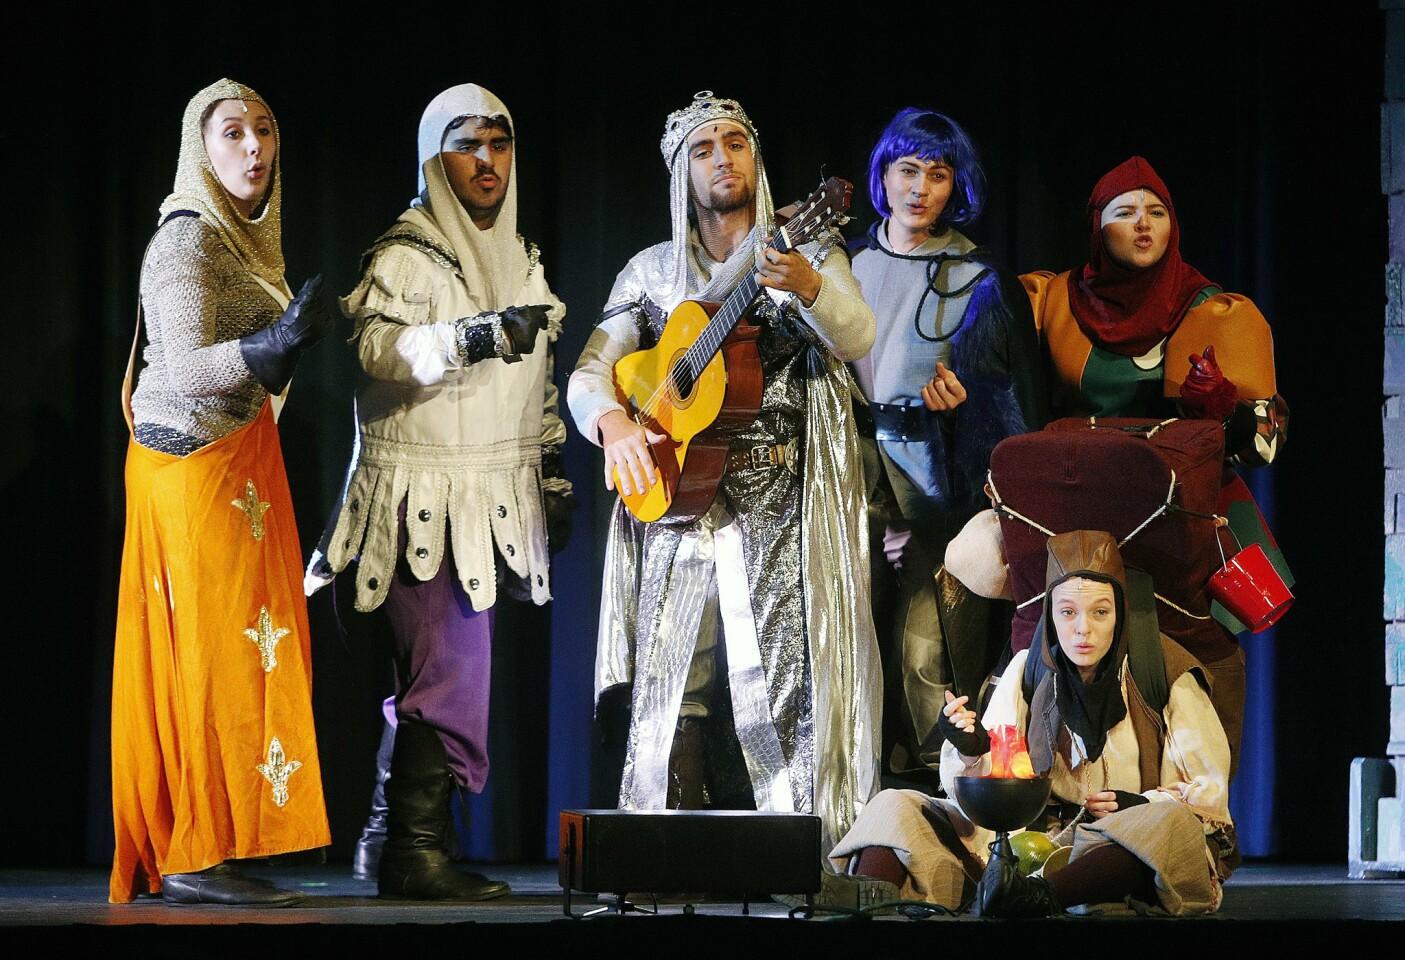 Photo Gallery: Burbank High School Drama Department dress rehearsal of Monty Python's Spamalot